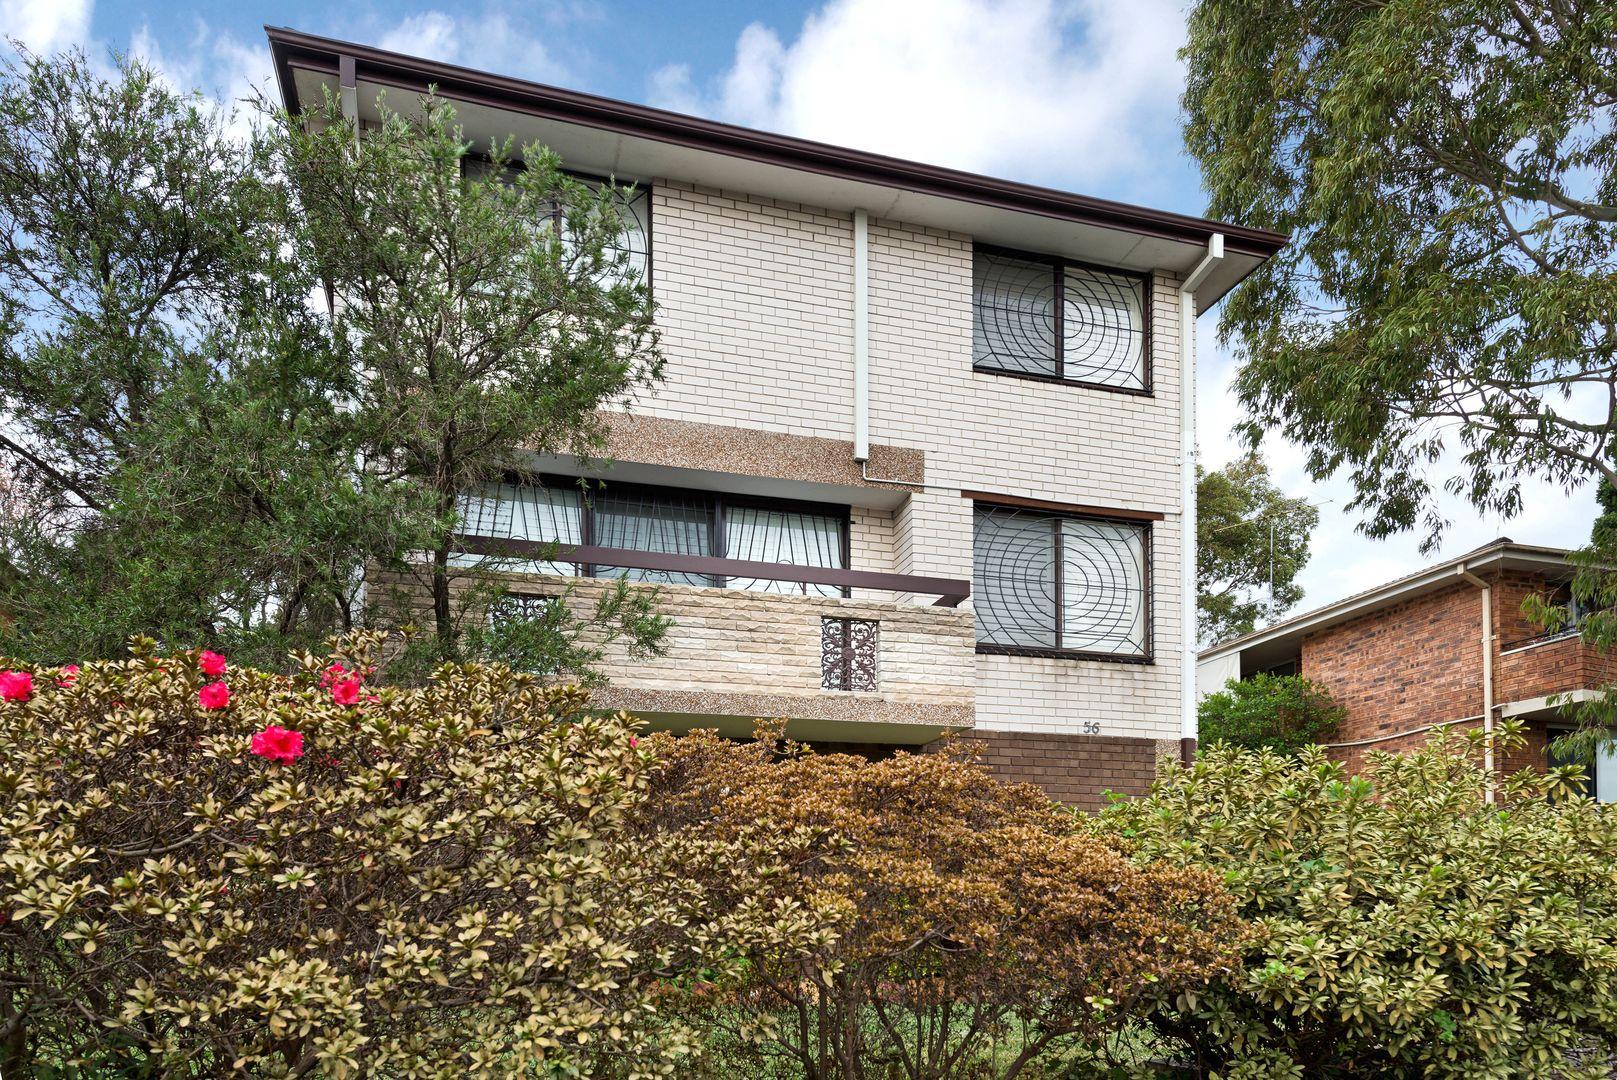 6/56 St Albans Street, Abbotsford NSW 2046, Image 2